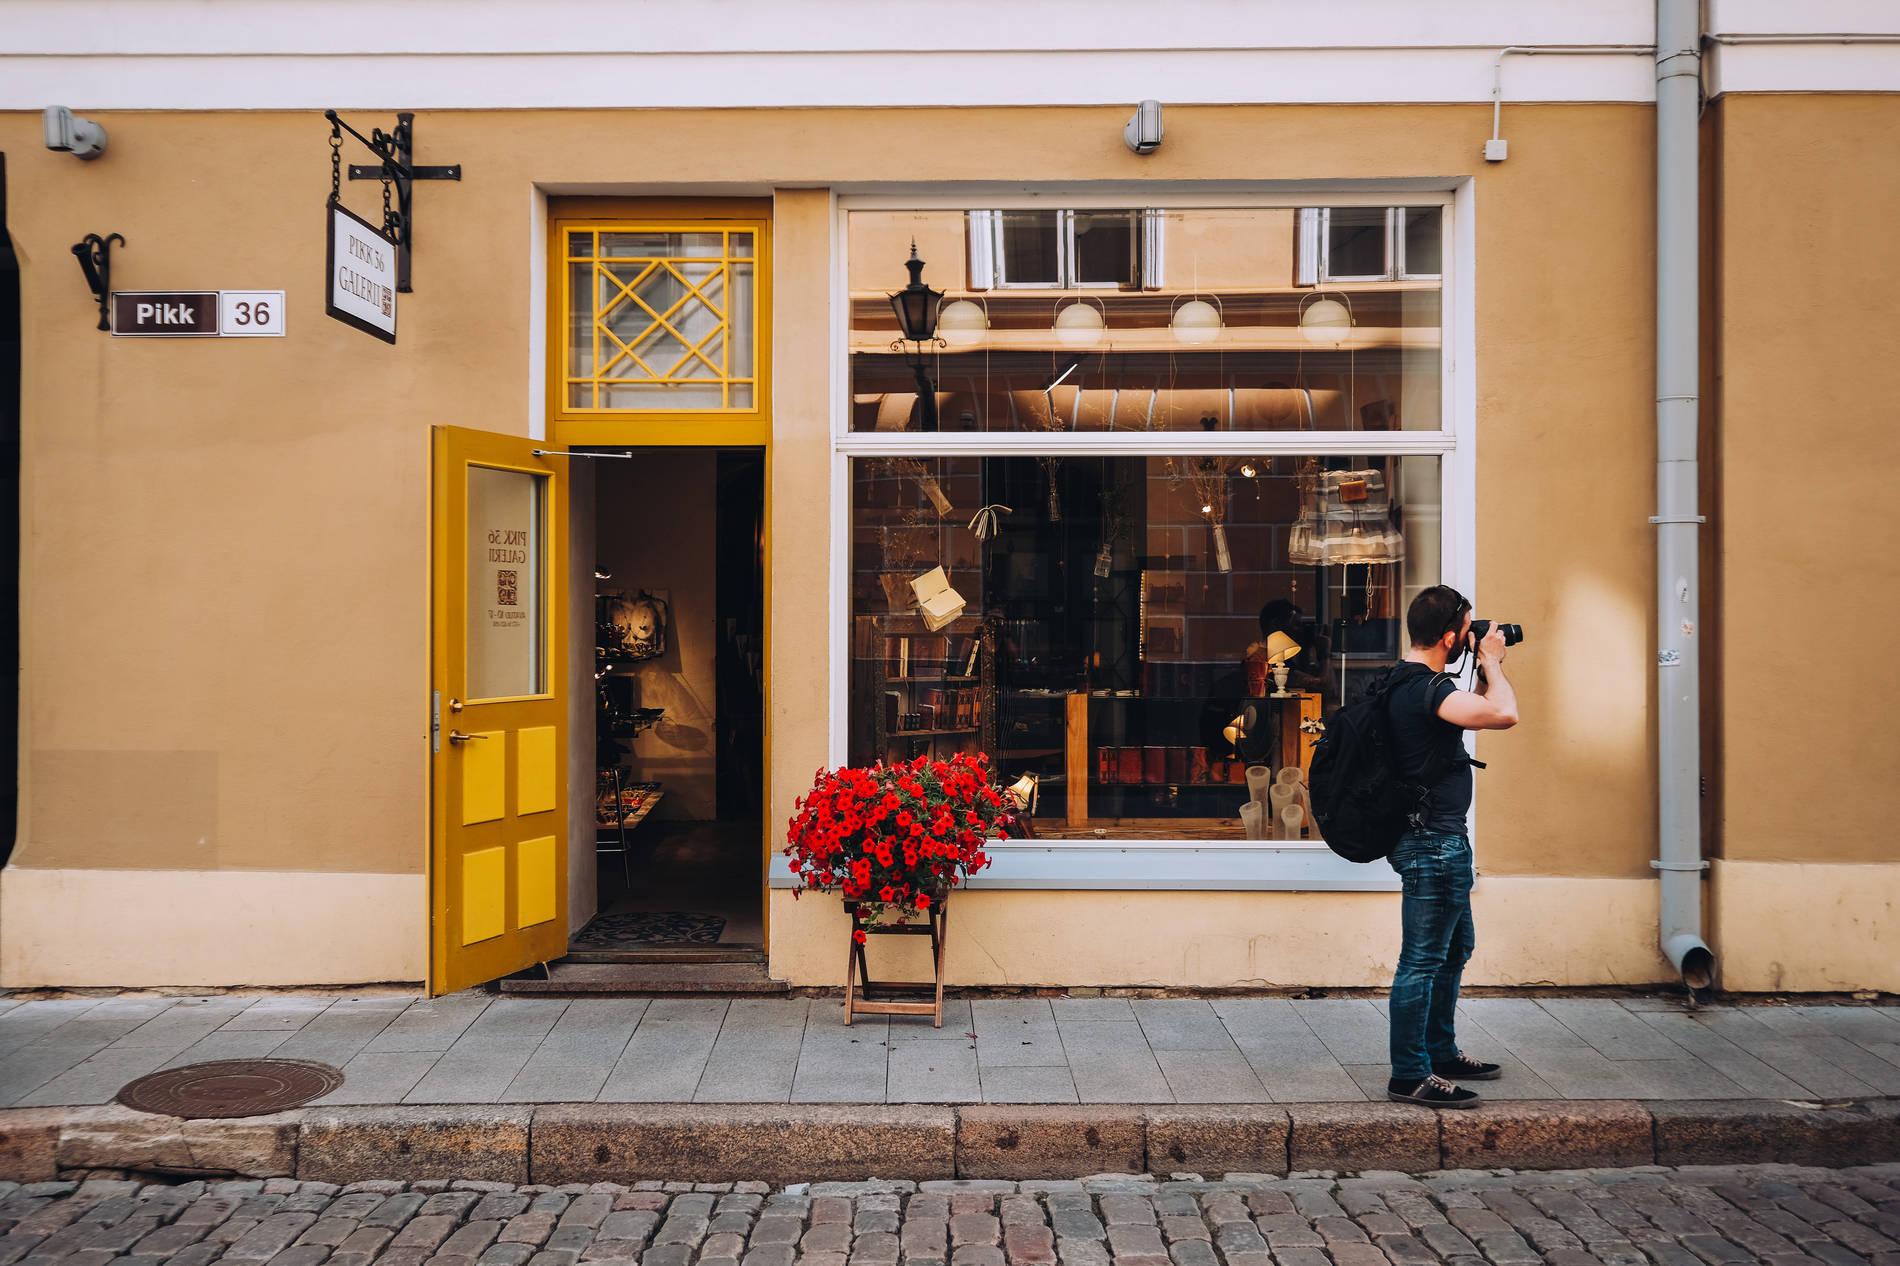 A shopfront in the Old Town of Tallinn, Estonia